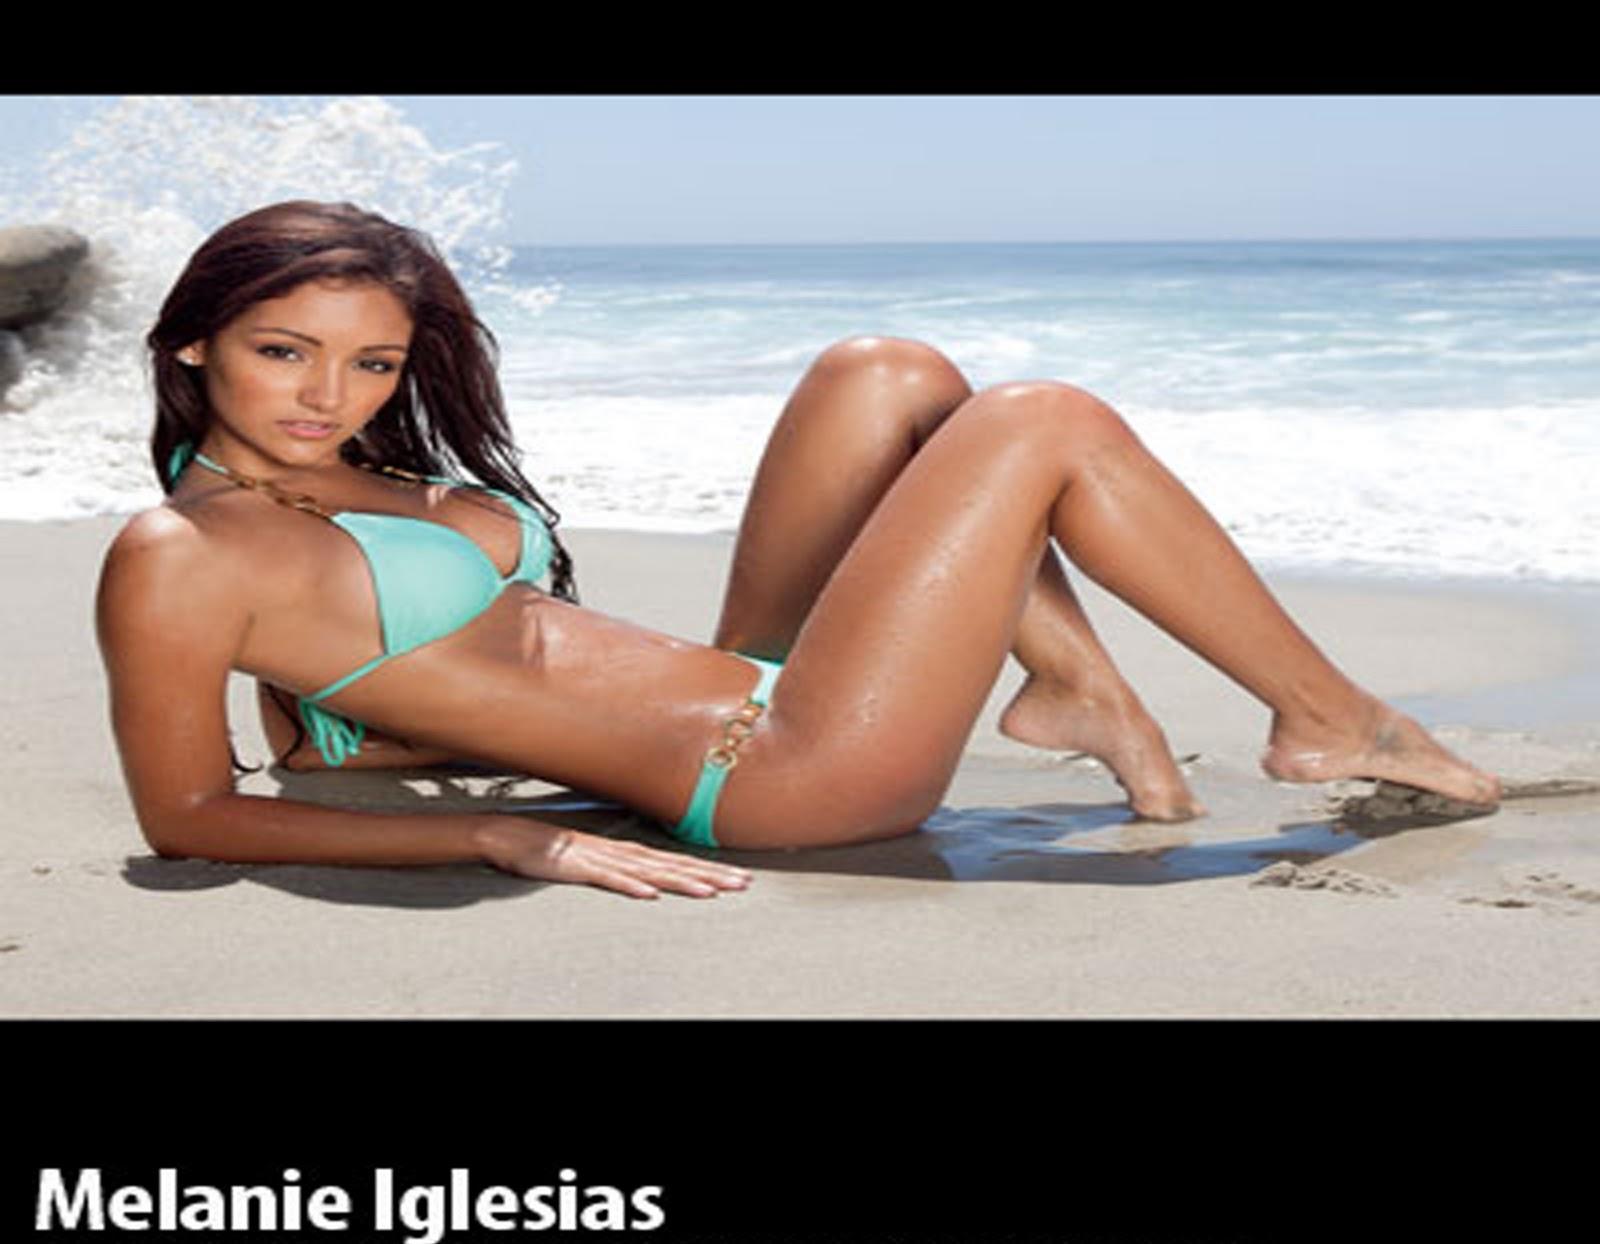 http://2.bp.blogspot.com/_p1bTc75Y5Fk/TQqTlmGkKAI/AAAAAAAAAEA/PAkgk1ZfGGQ/s1600/Melanie+iglesias2.jpg